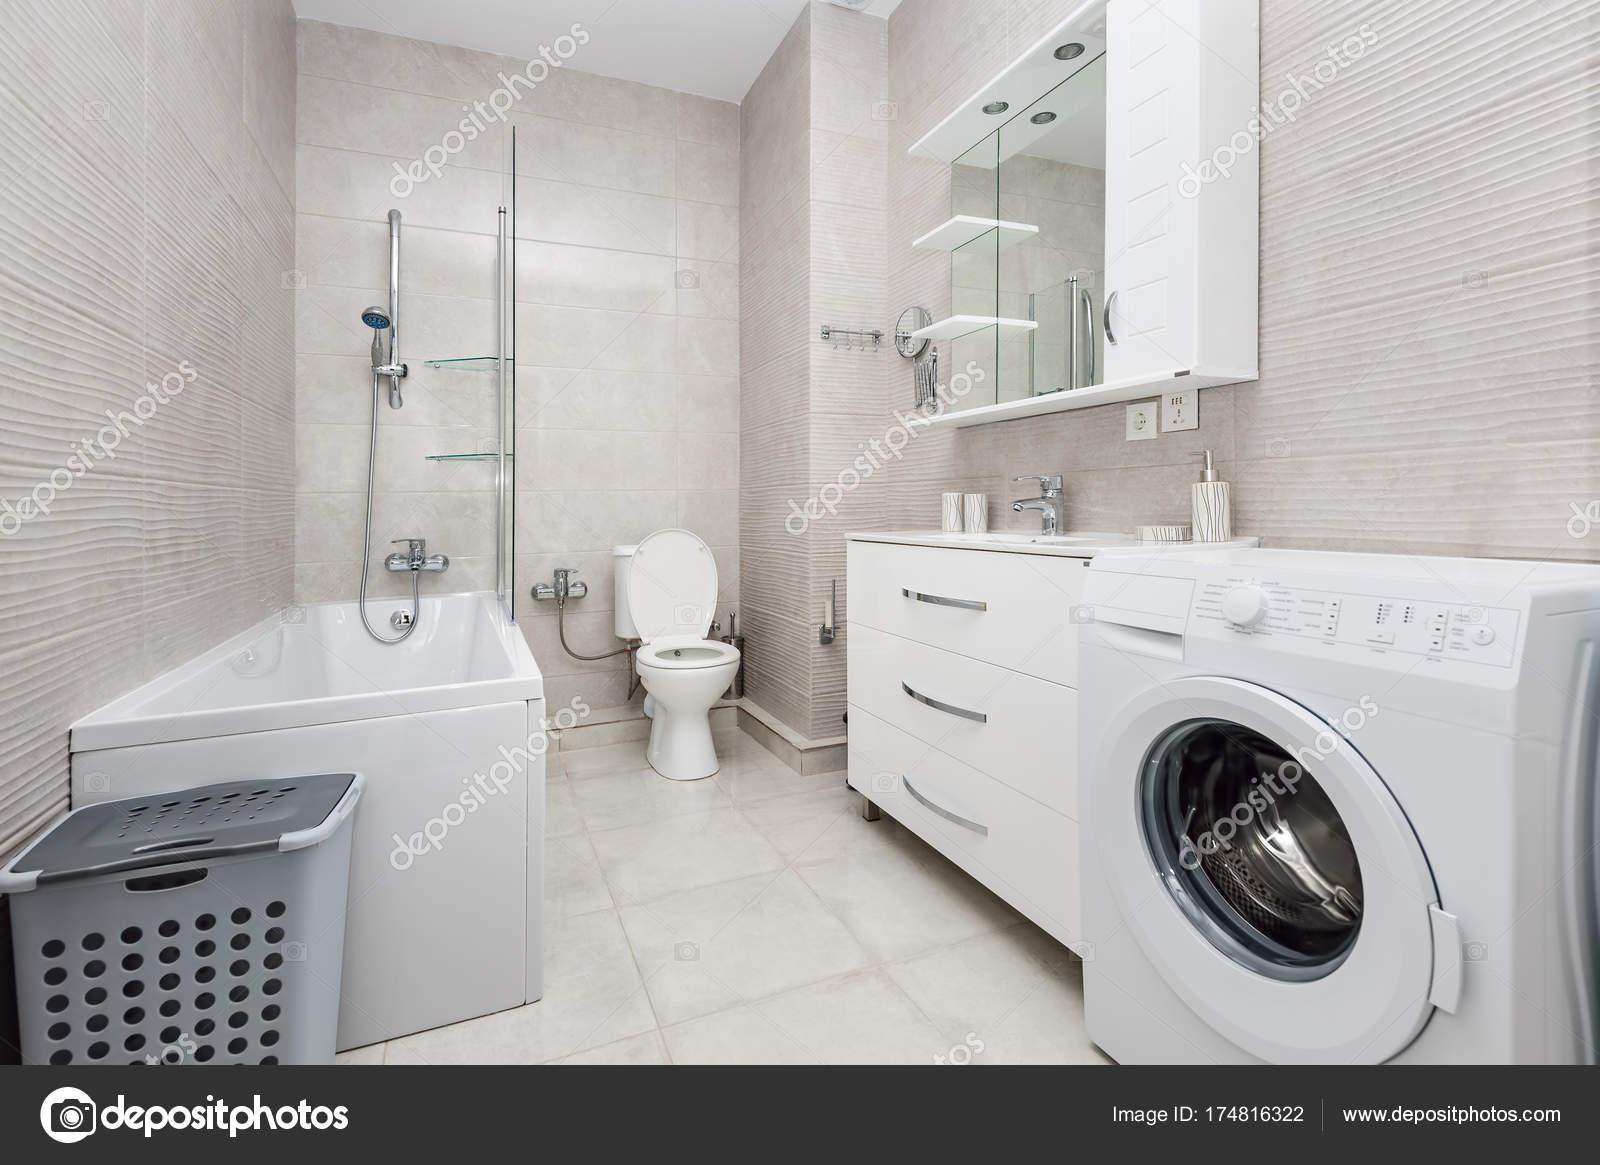 Moderne Witte Badkamer : Moderne witte badkamer interieur u2014 stockfoto © starush #174816322